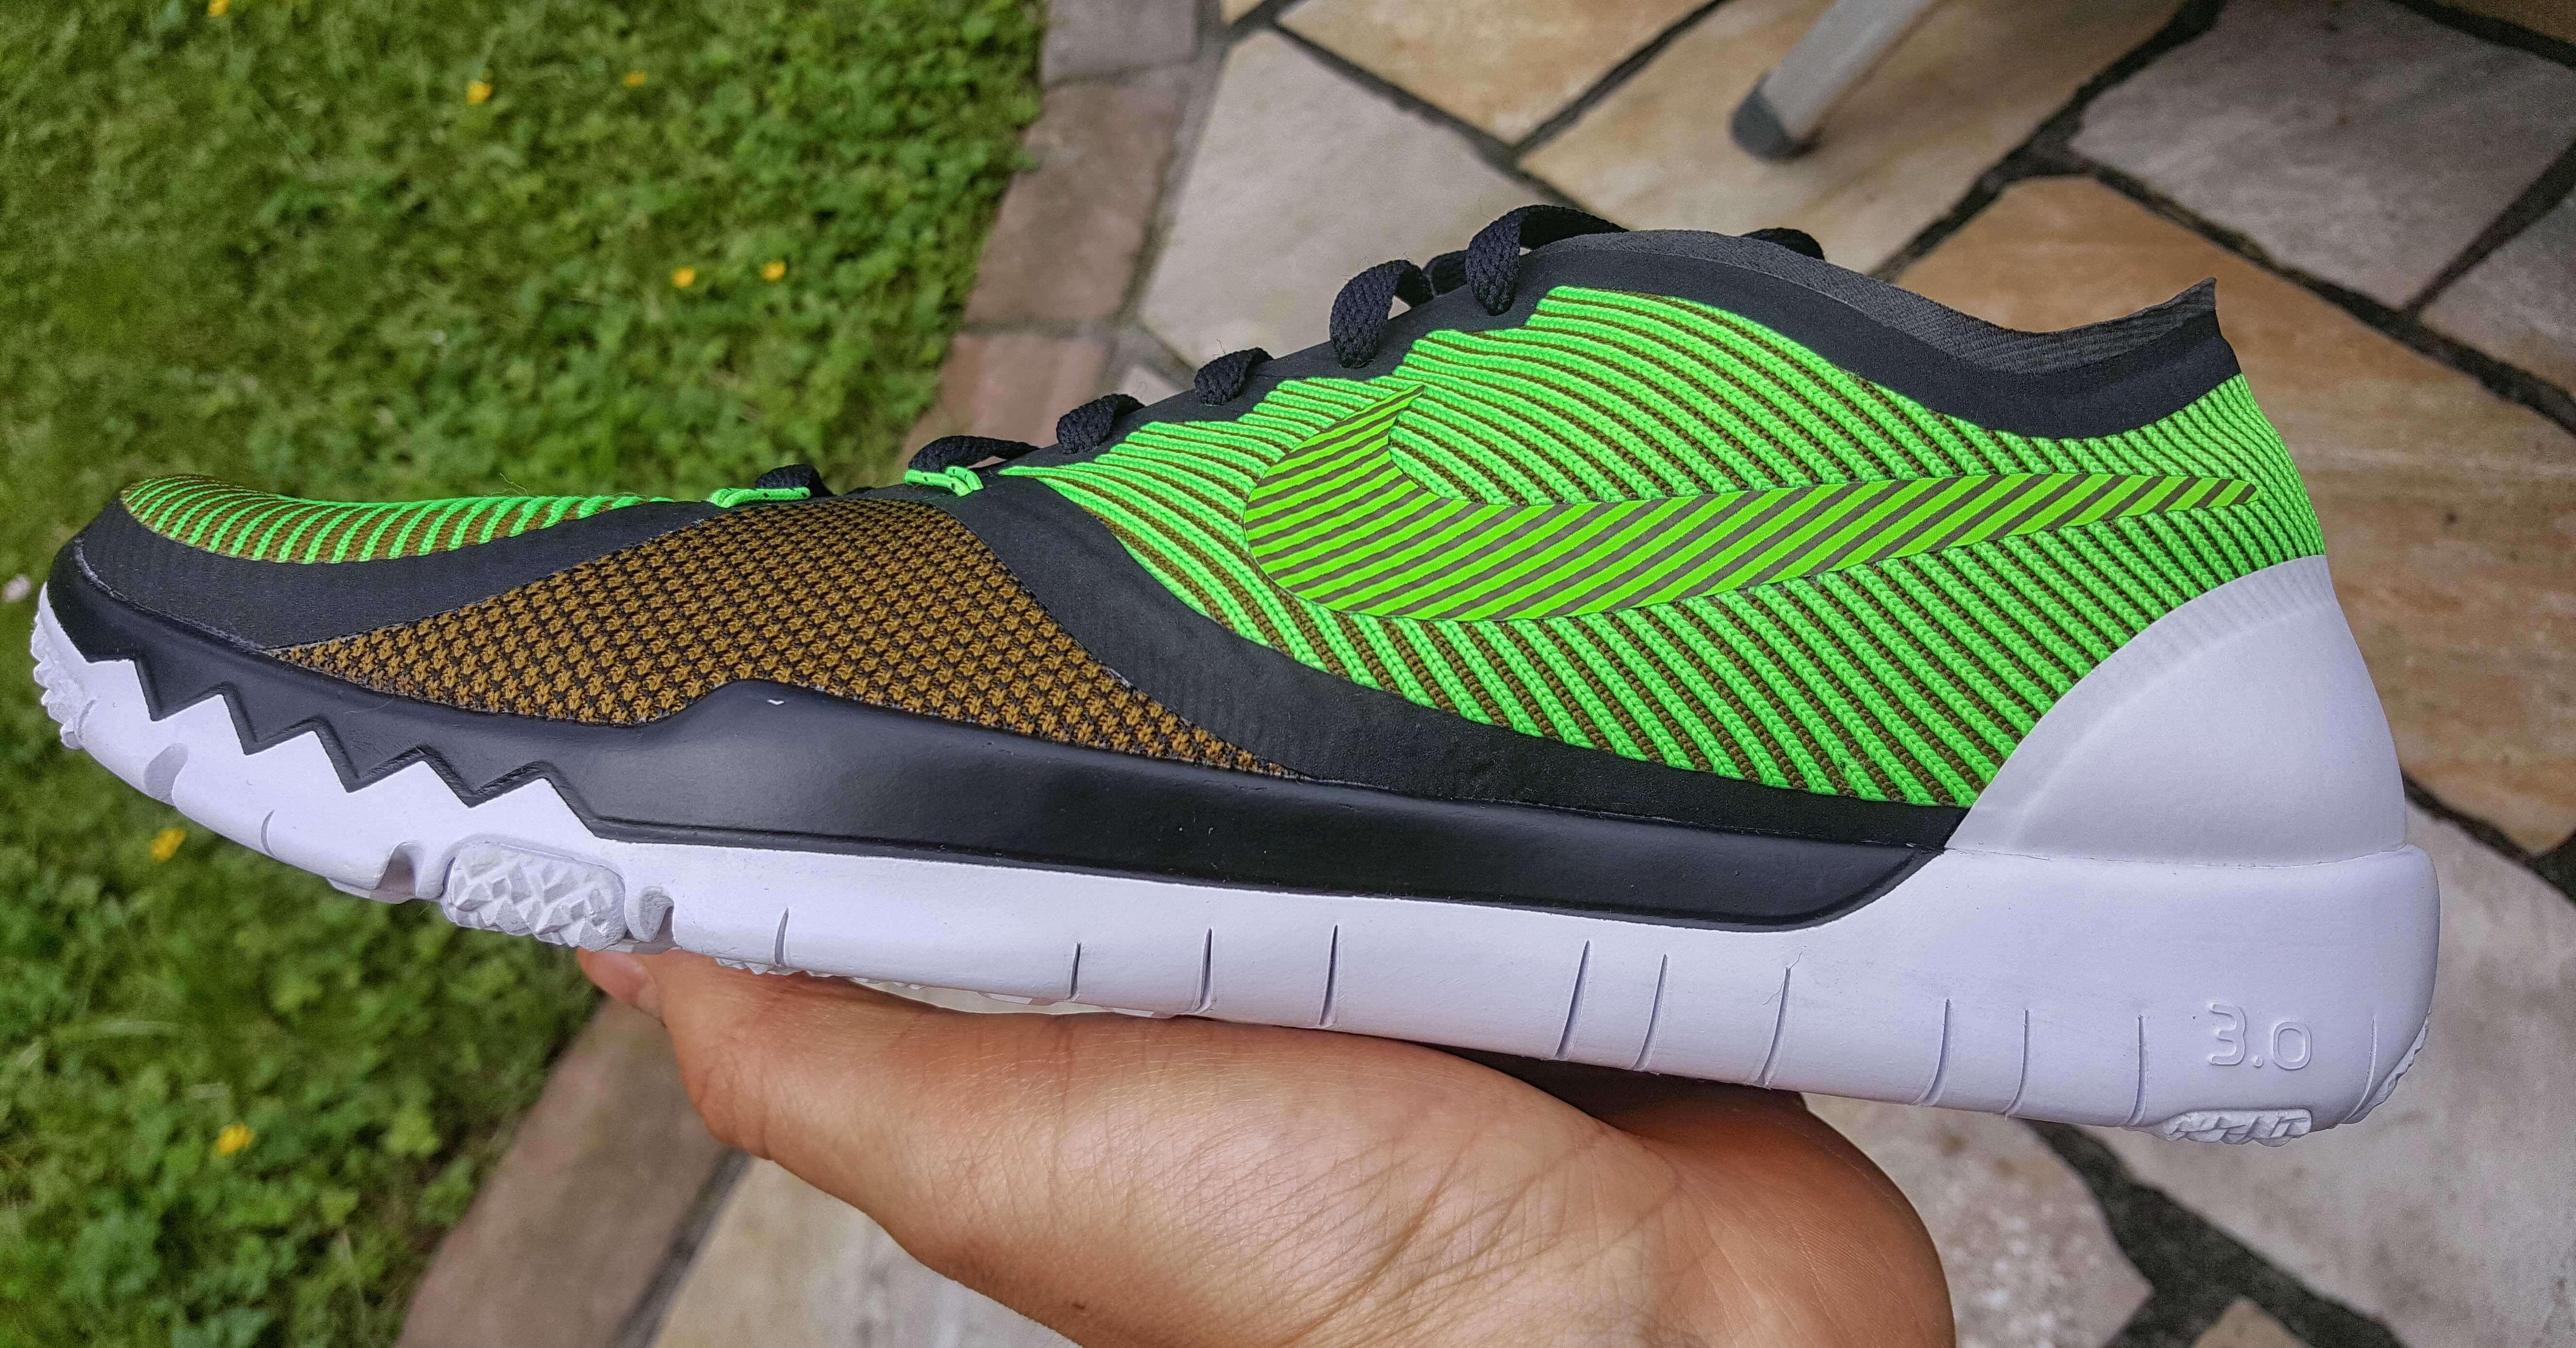 29c8a63333507a Nike Free sind keine Barfußschuhe!